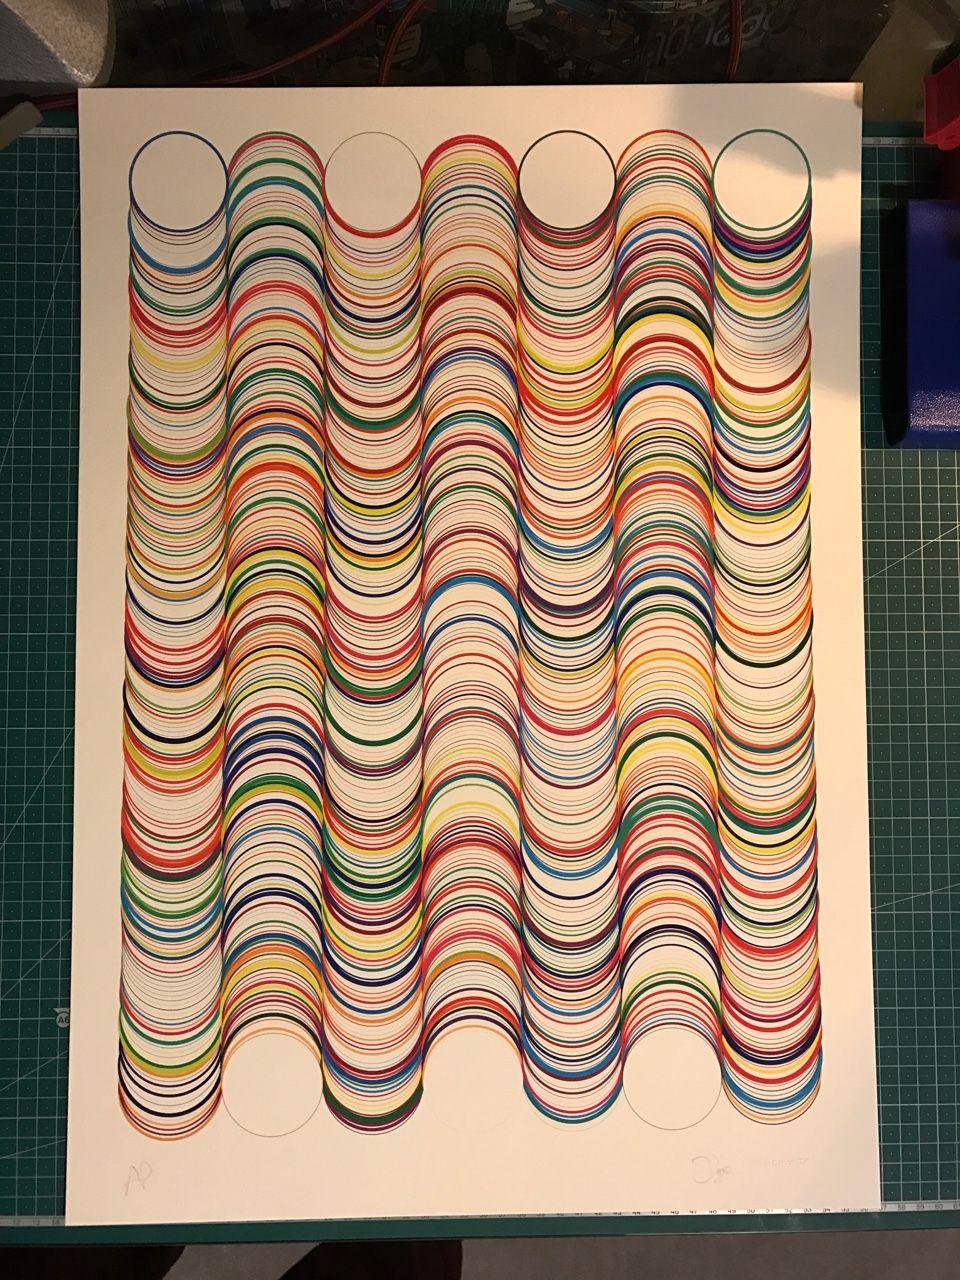 simoncpage:  Optical wave variant 17